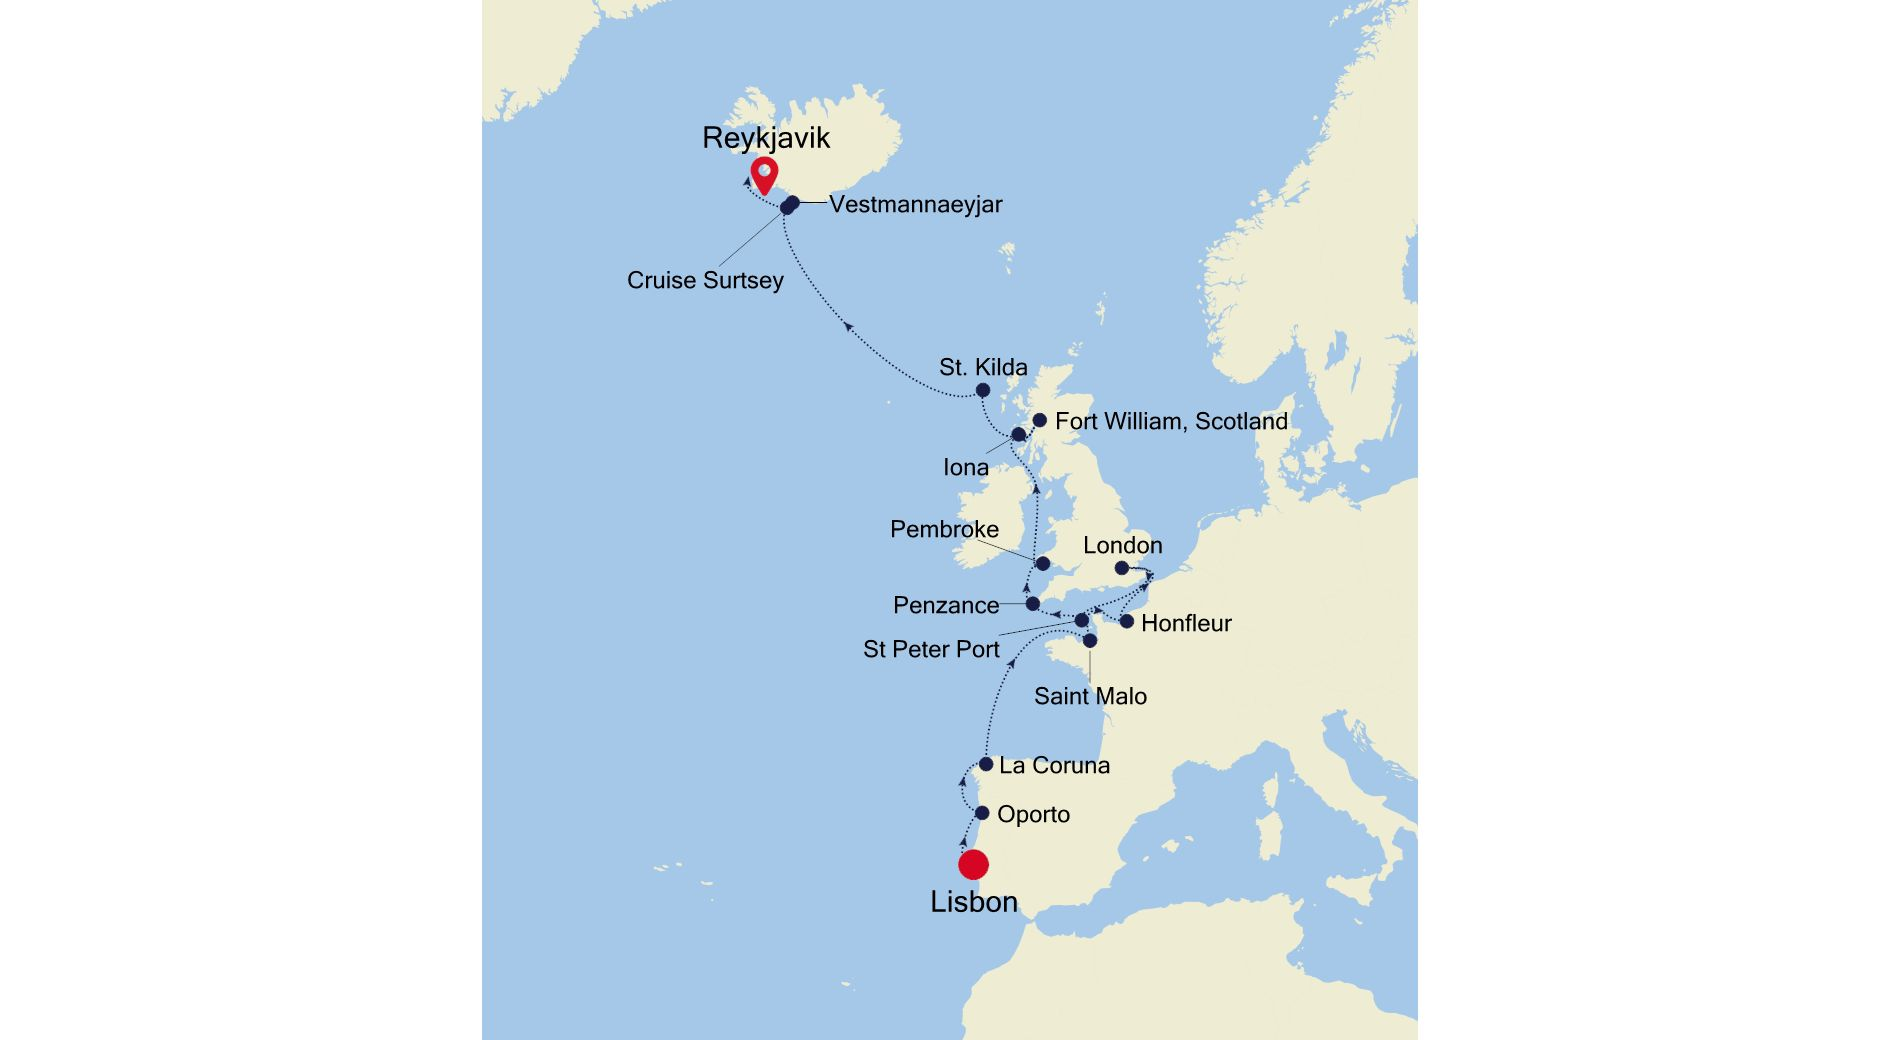 E4210616017 - Lisbon nach Reykjavik